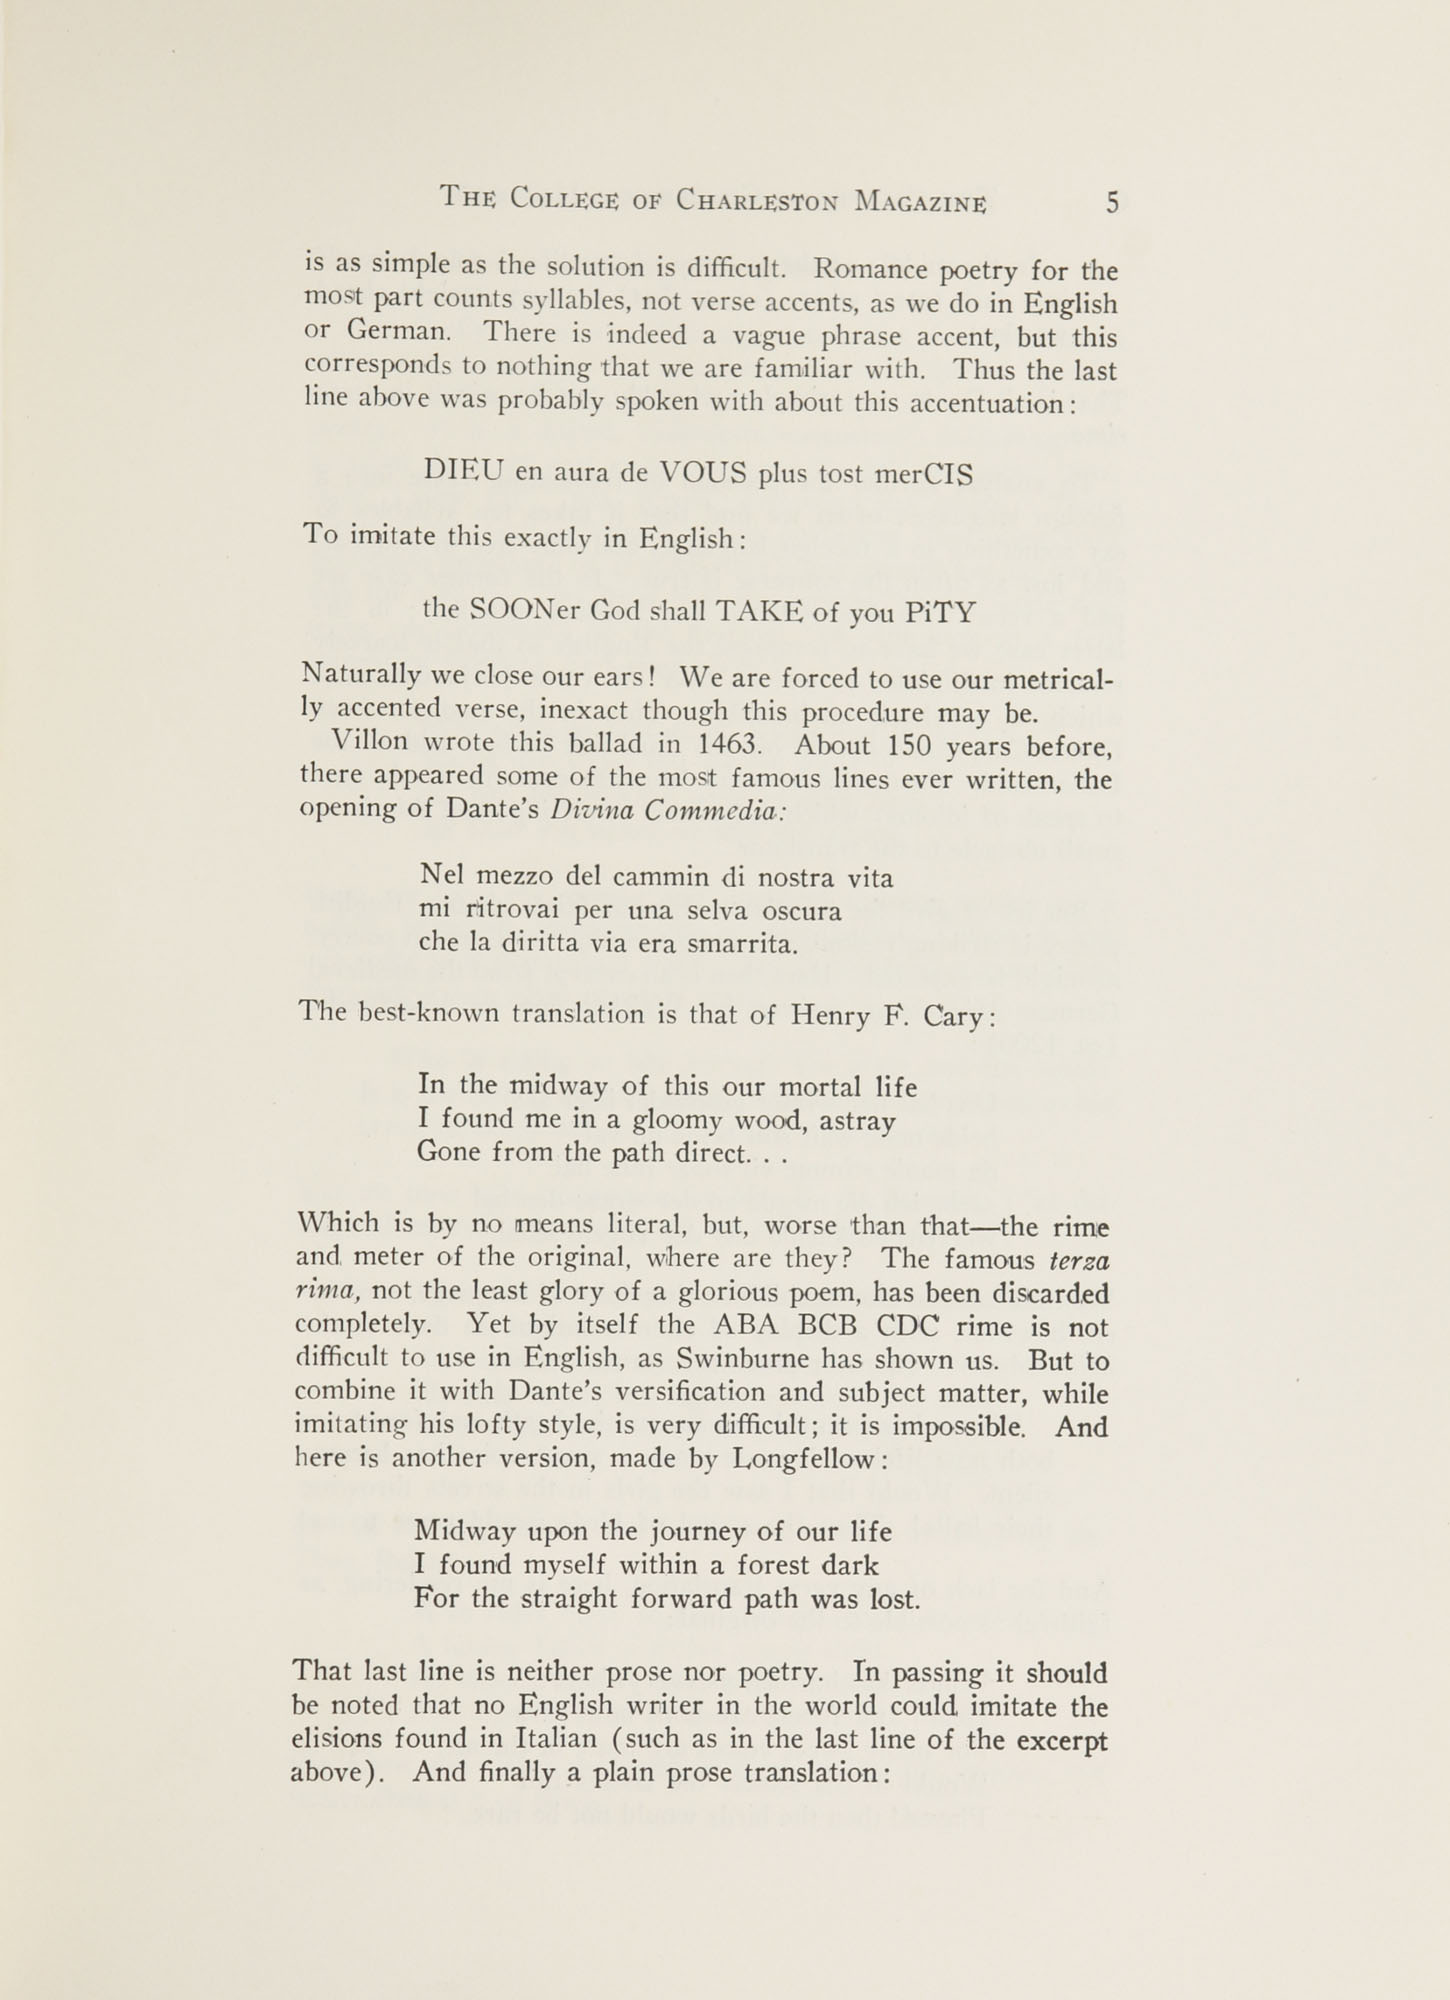 College of Charleston Magazine, 1941-1942, Vol. 45 No. 1, page 5